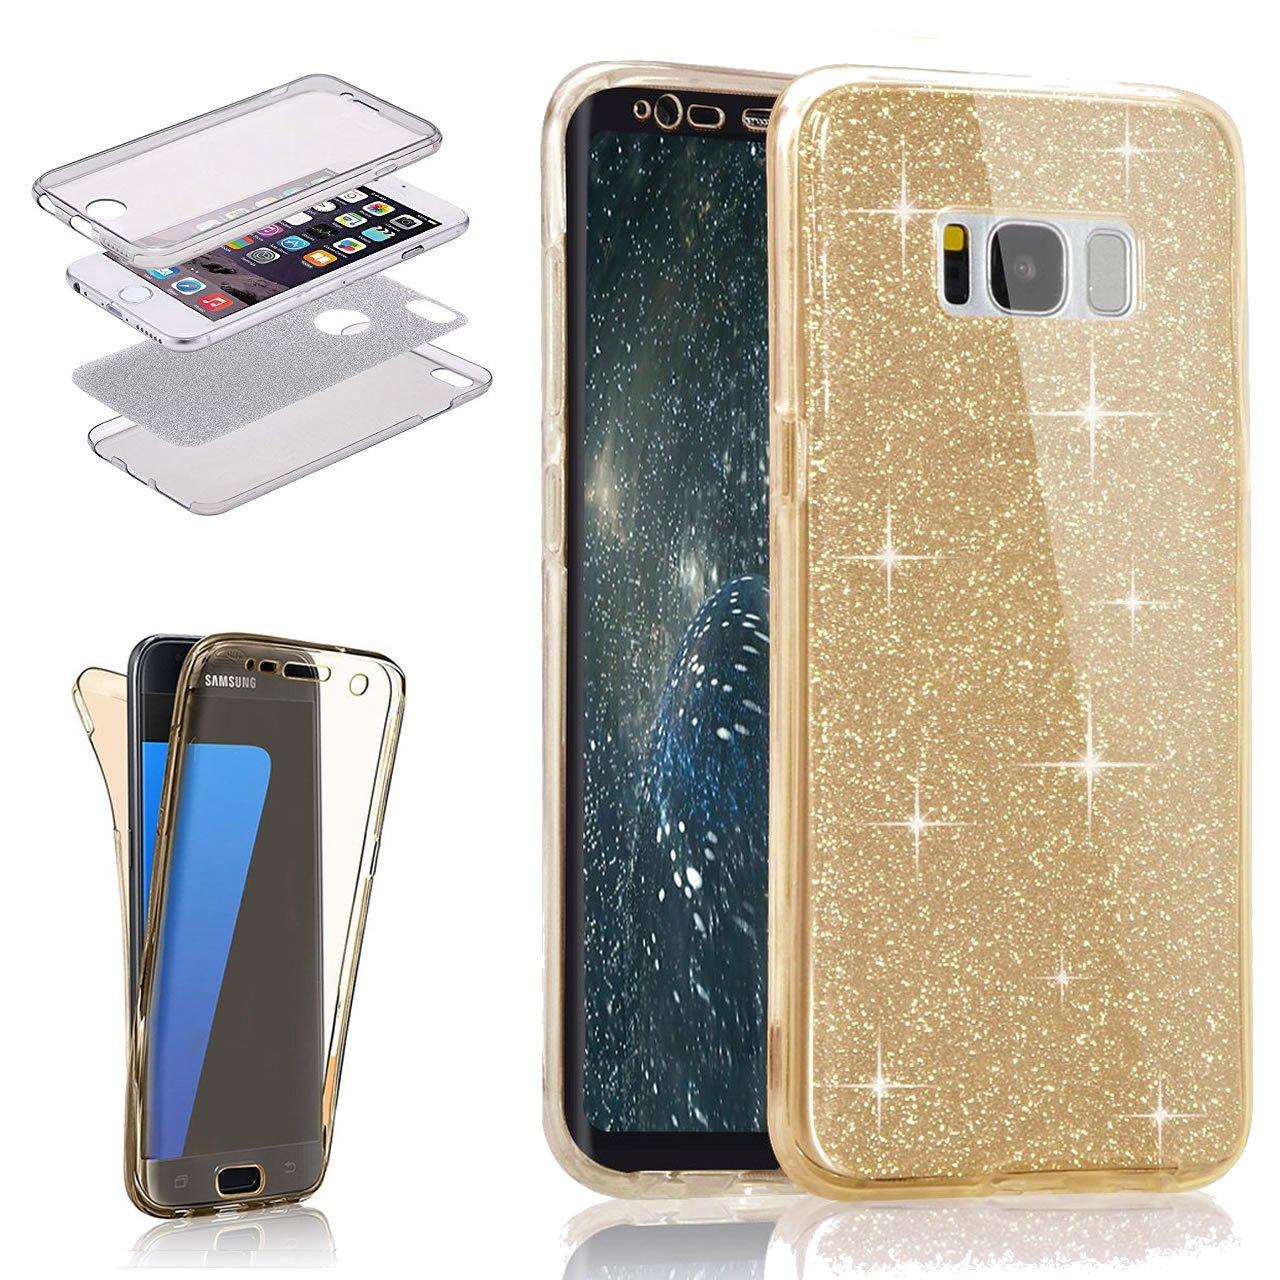 Amazoncom Galaxy S8 Glitter Casegalaxy S8 Bing Tpu Coverleecase